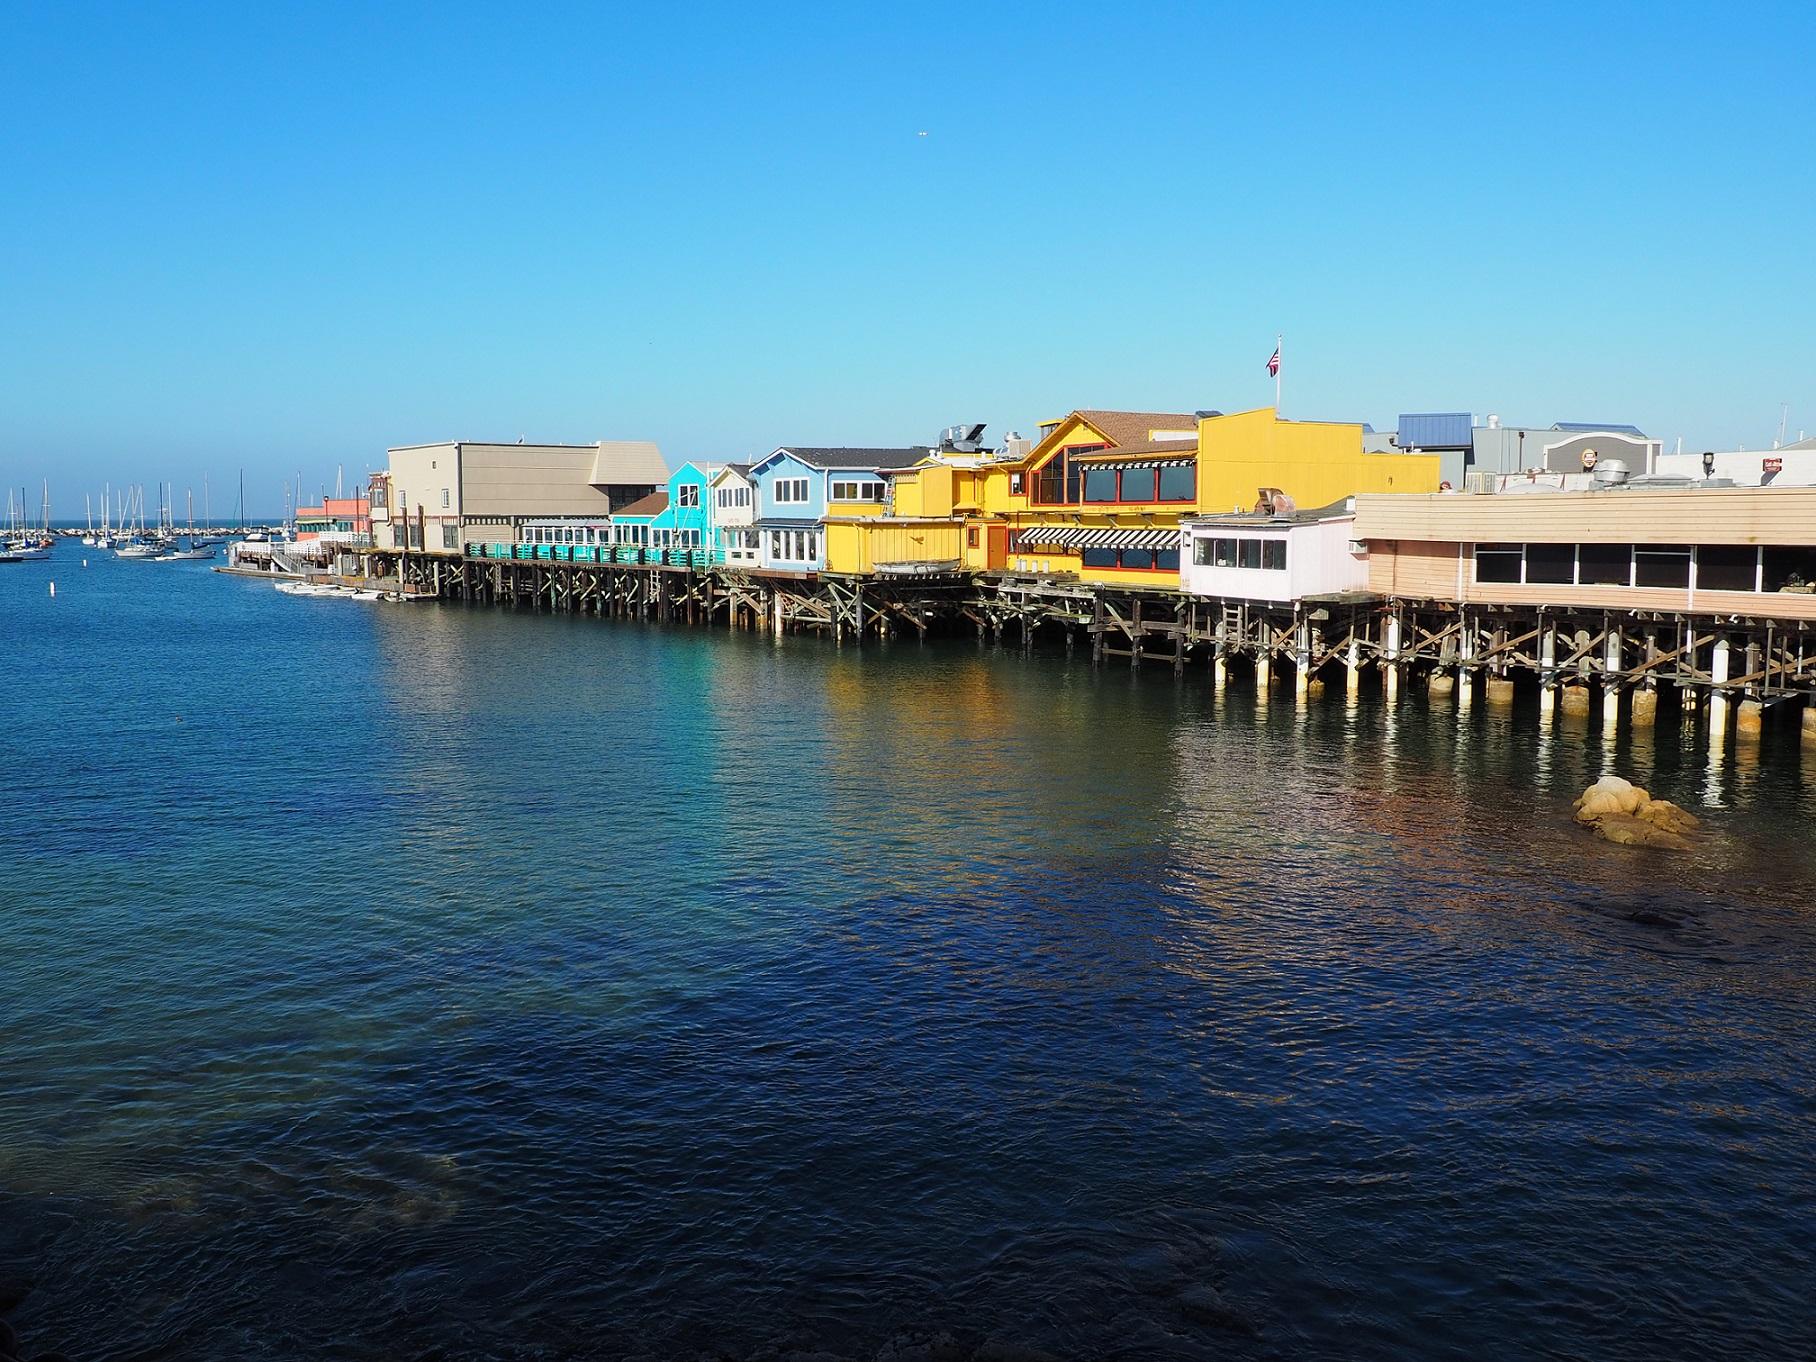 Old Fisherman's Wharf à Monterey en Californie